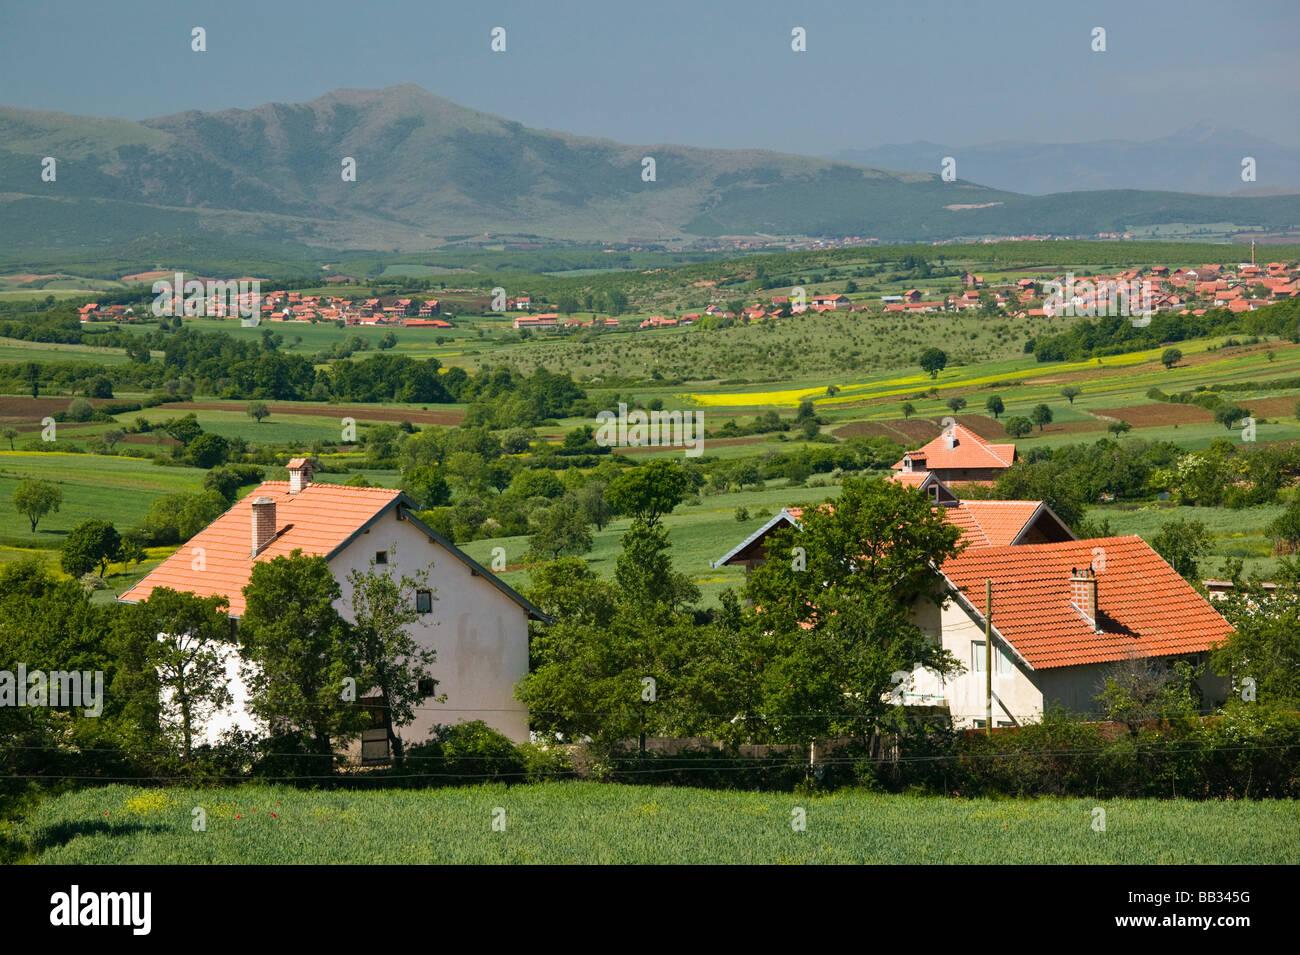 KOSOVO, Balince. View of Muslim village of BALINCE rebuilt after Kosovo War (1998-1999) - Stock Image